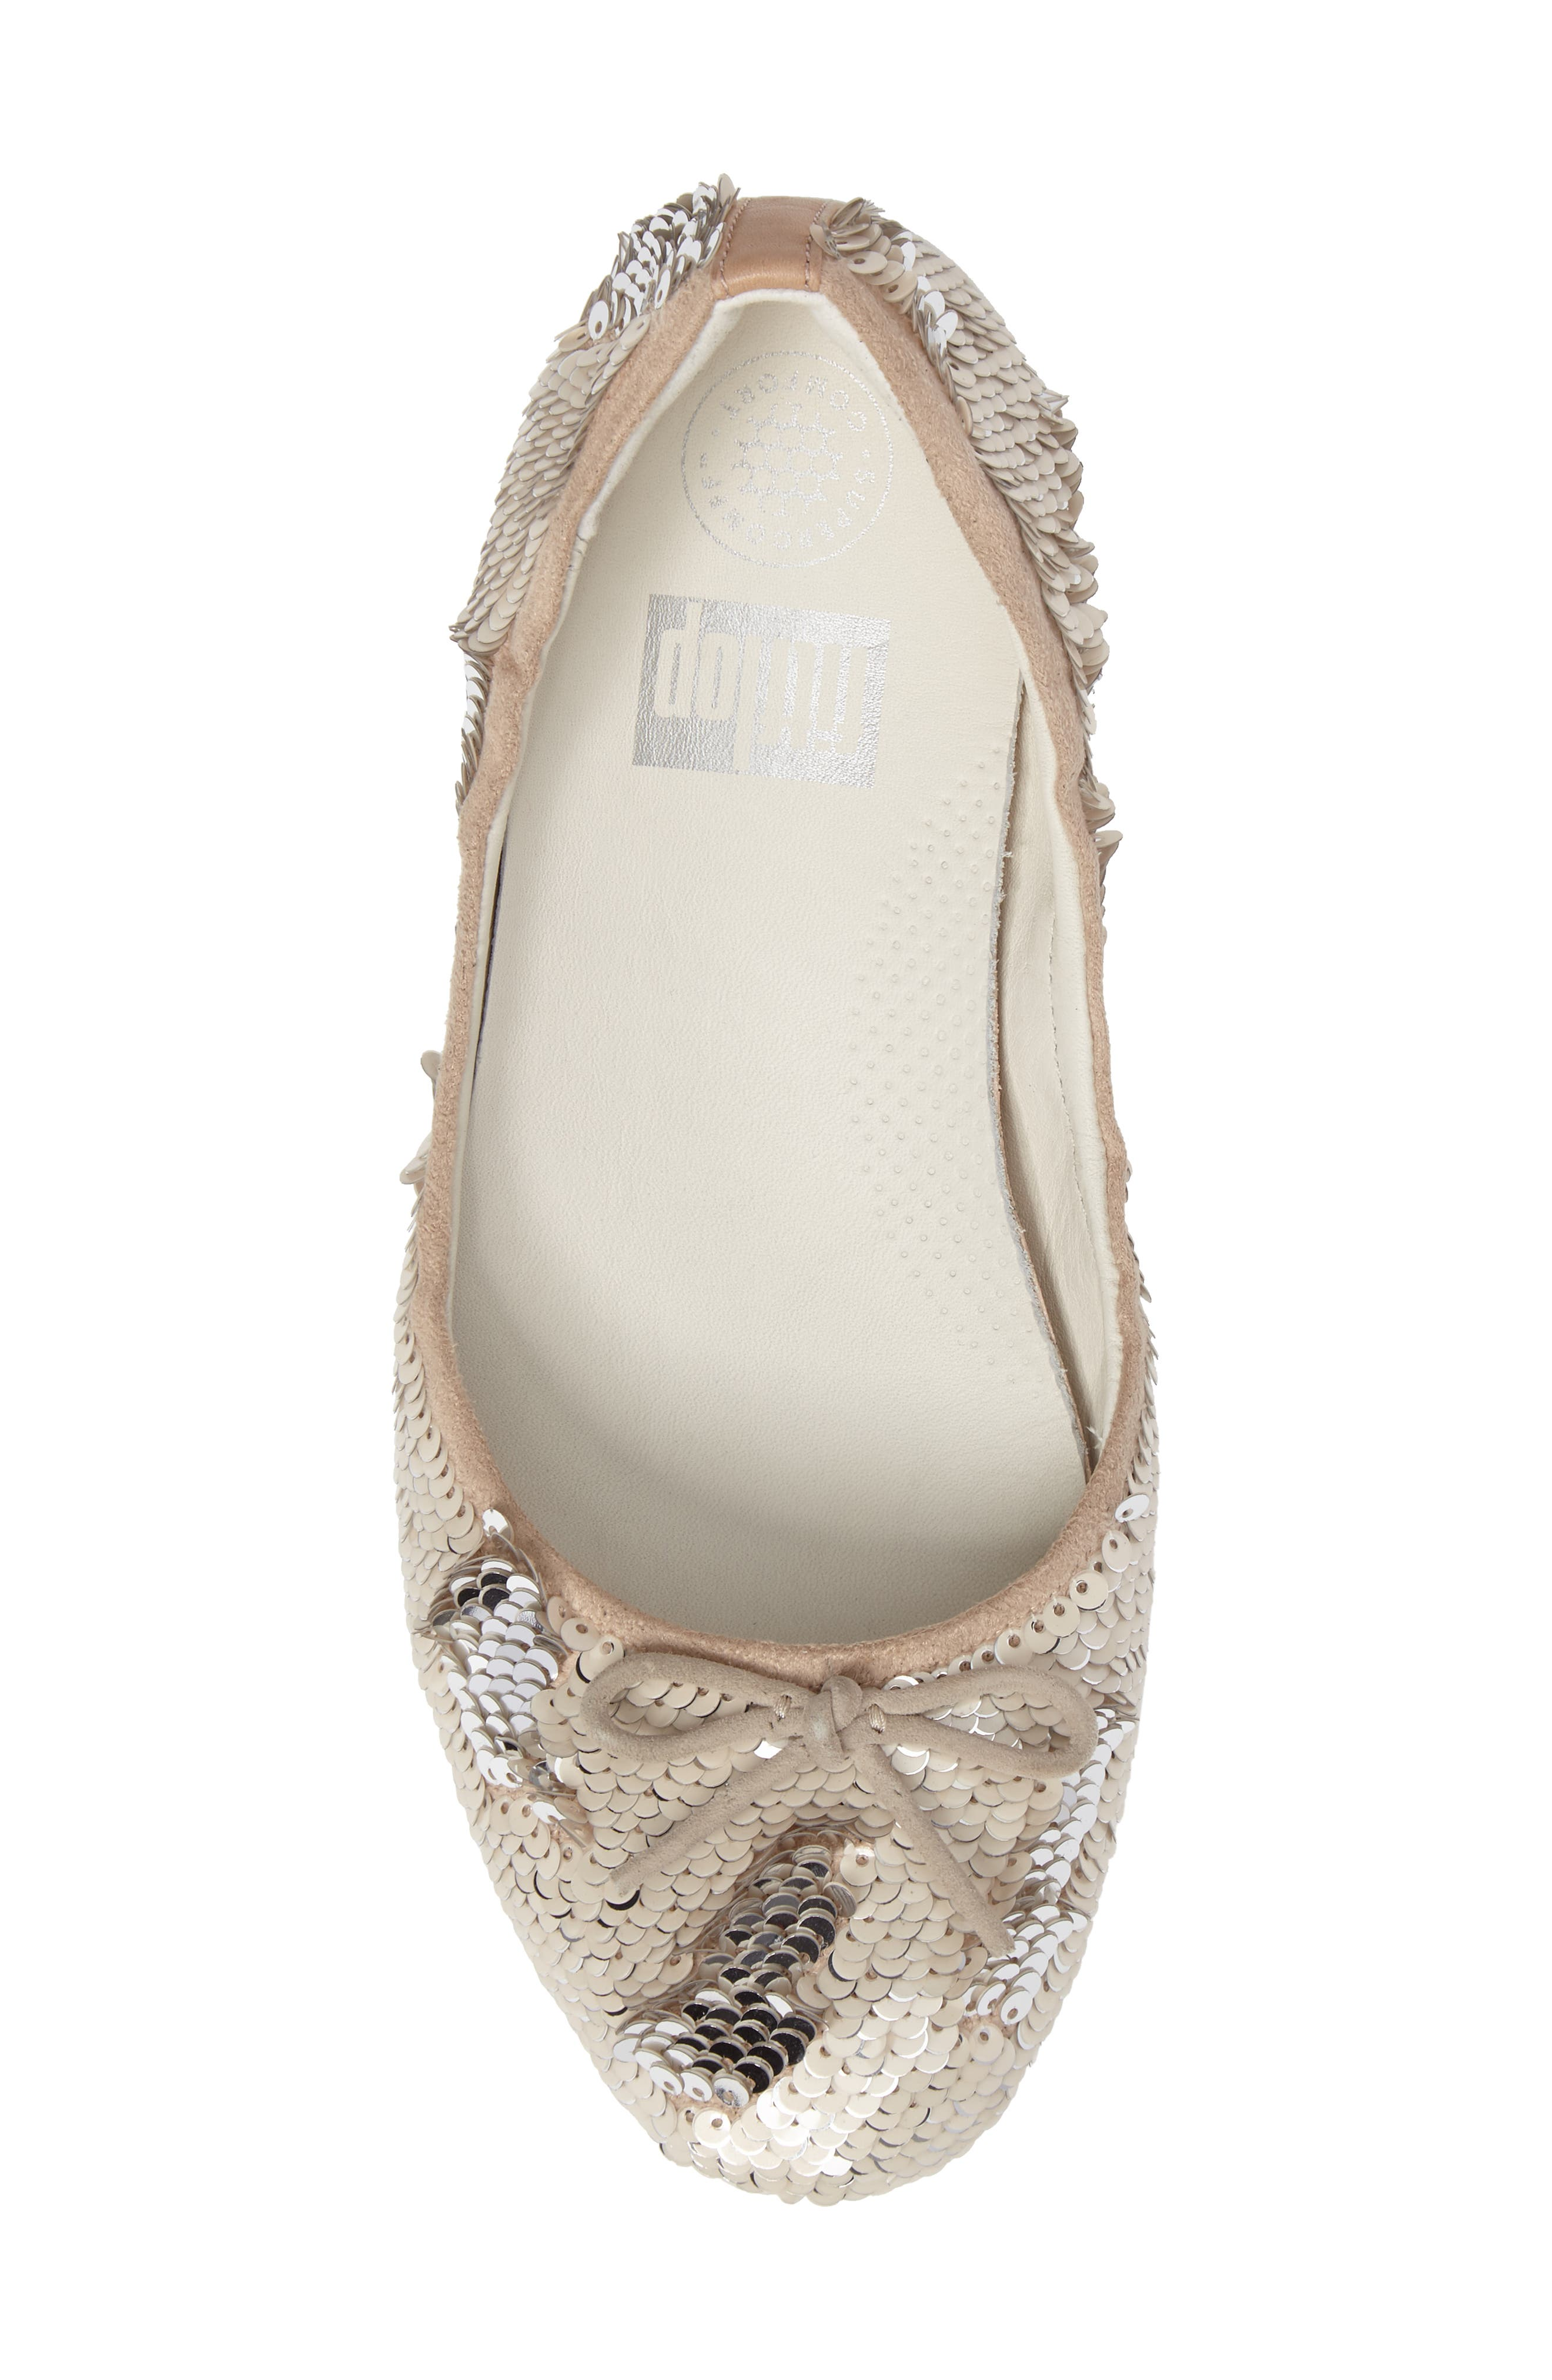 Superballerina Sequin Ballet Flat,                             Alternate thumbnail 10, color,